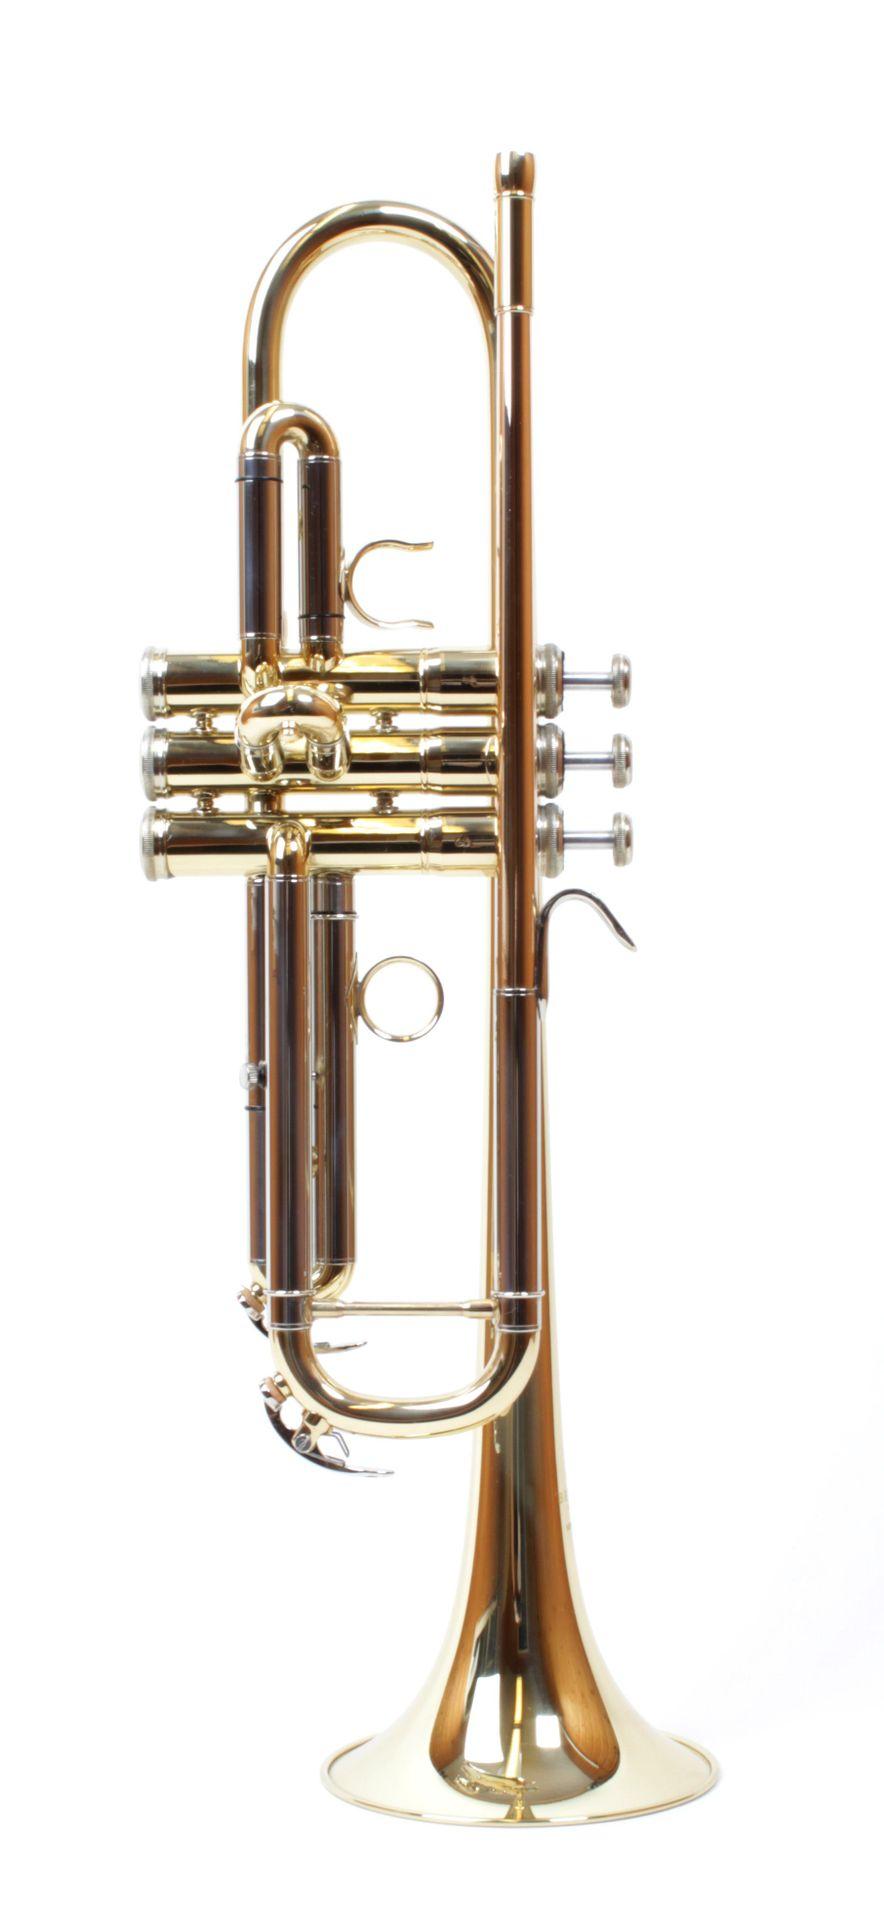 Besson BE-110  B-Trompete, Bohrung 11,66mm, , incl.Etui u. Pflegeset